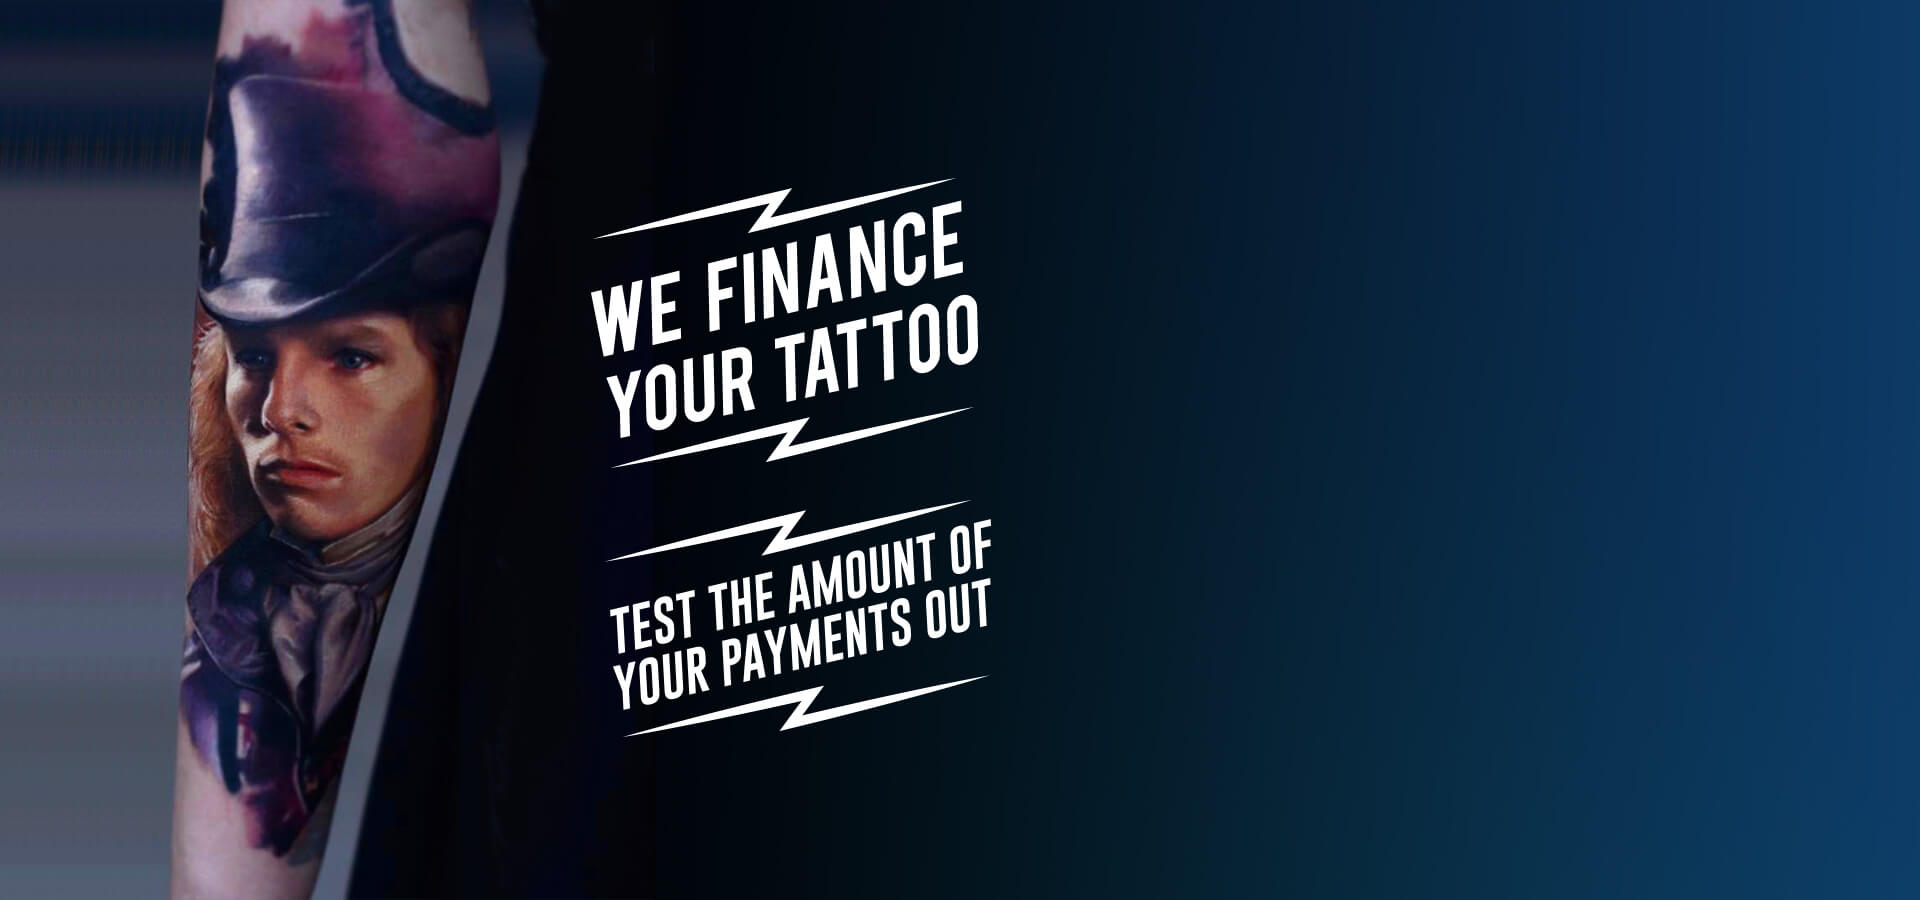 Finance tattoo Barcelona